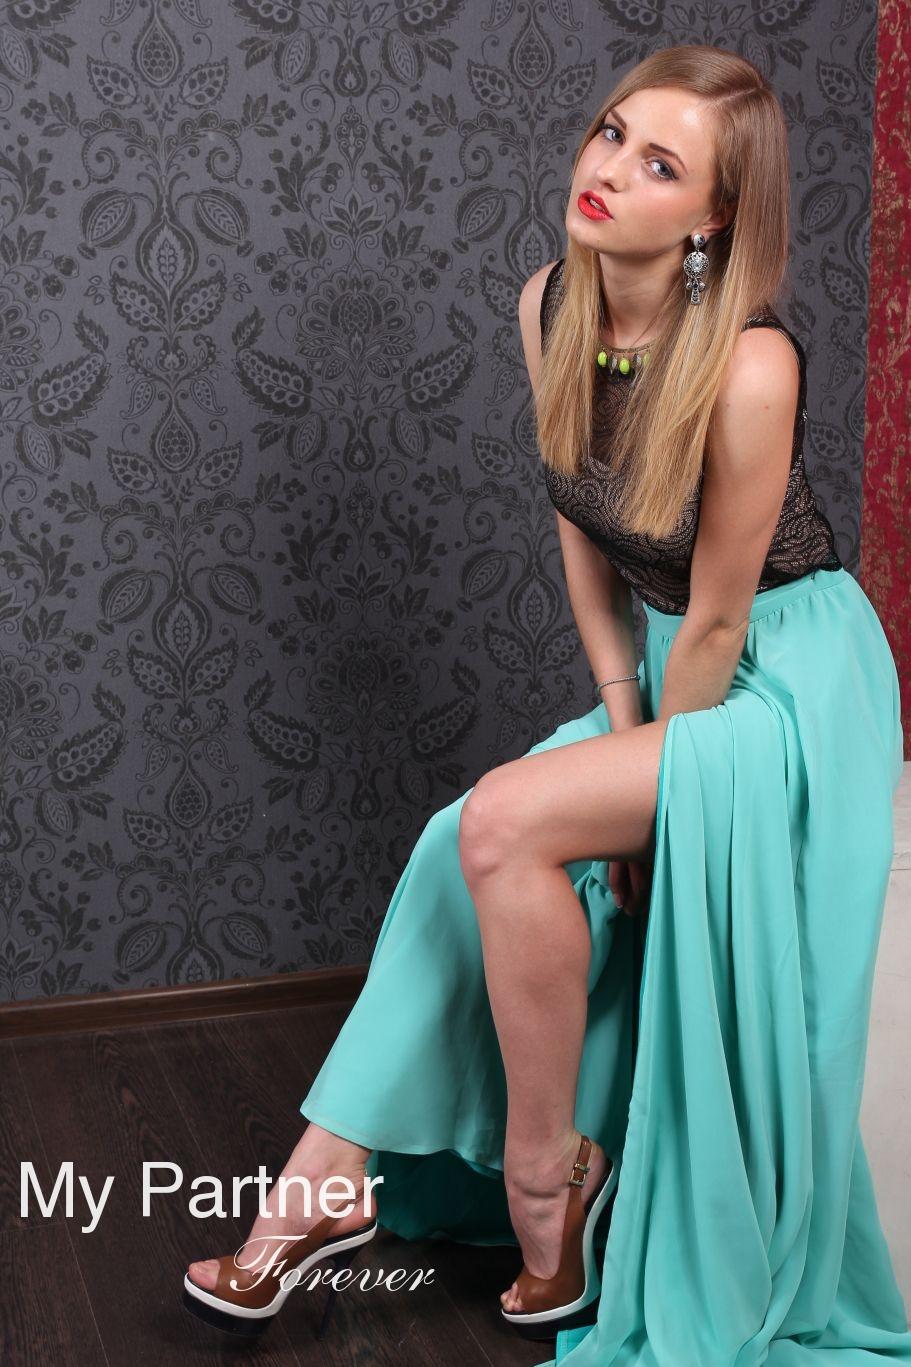 Datingsite to Meet Charming Ukrainian Woman Tatiyana from Vinnitsa, Ukraine